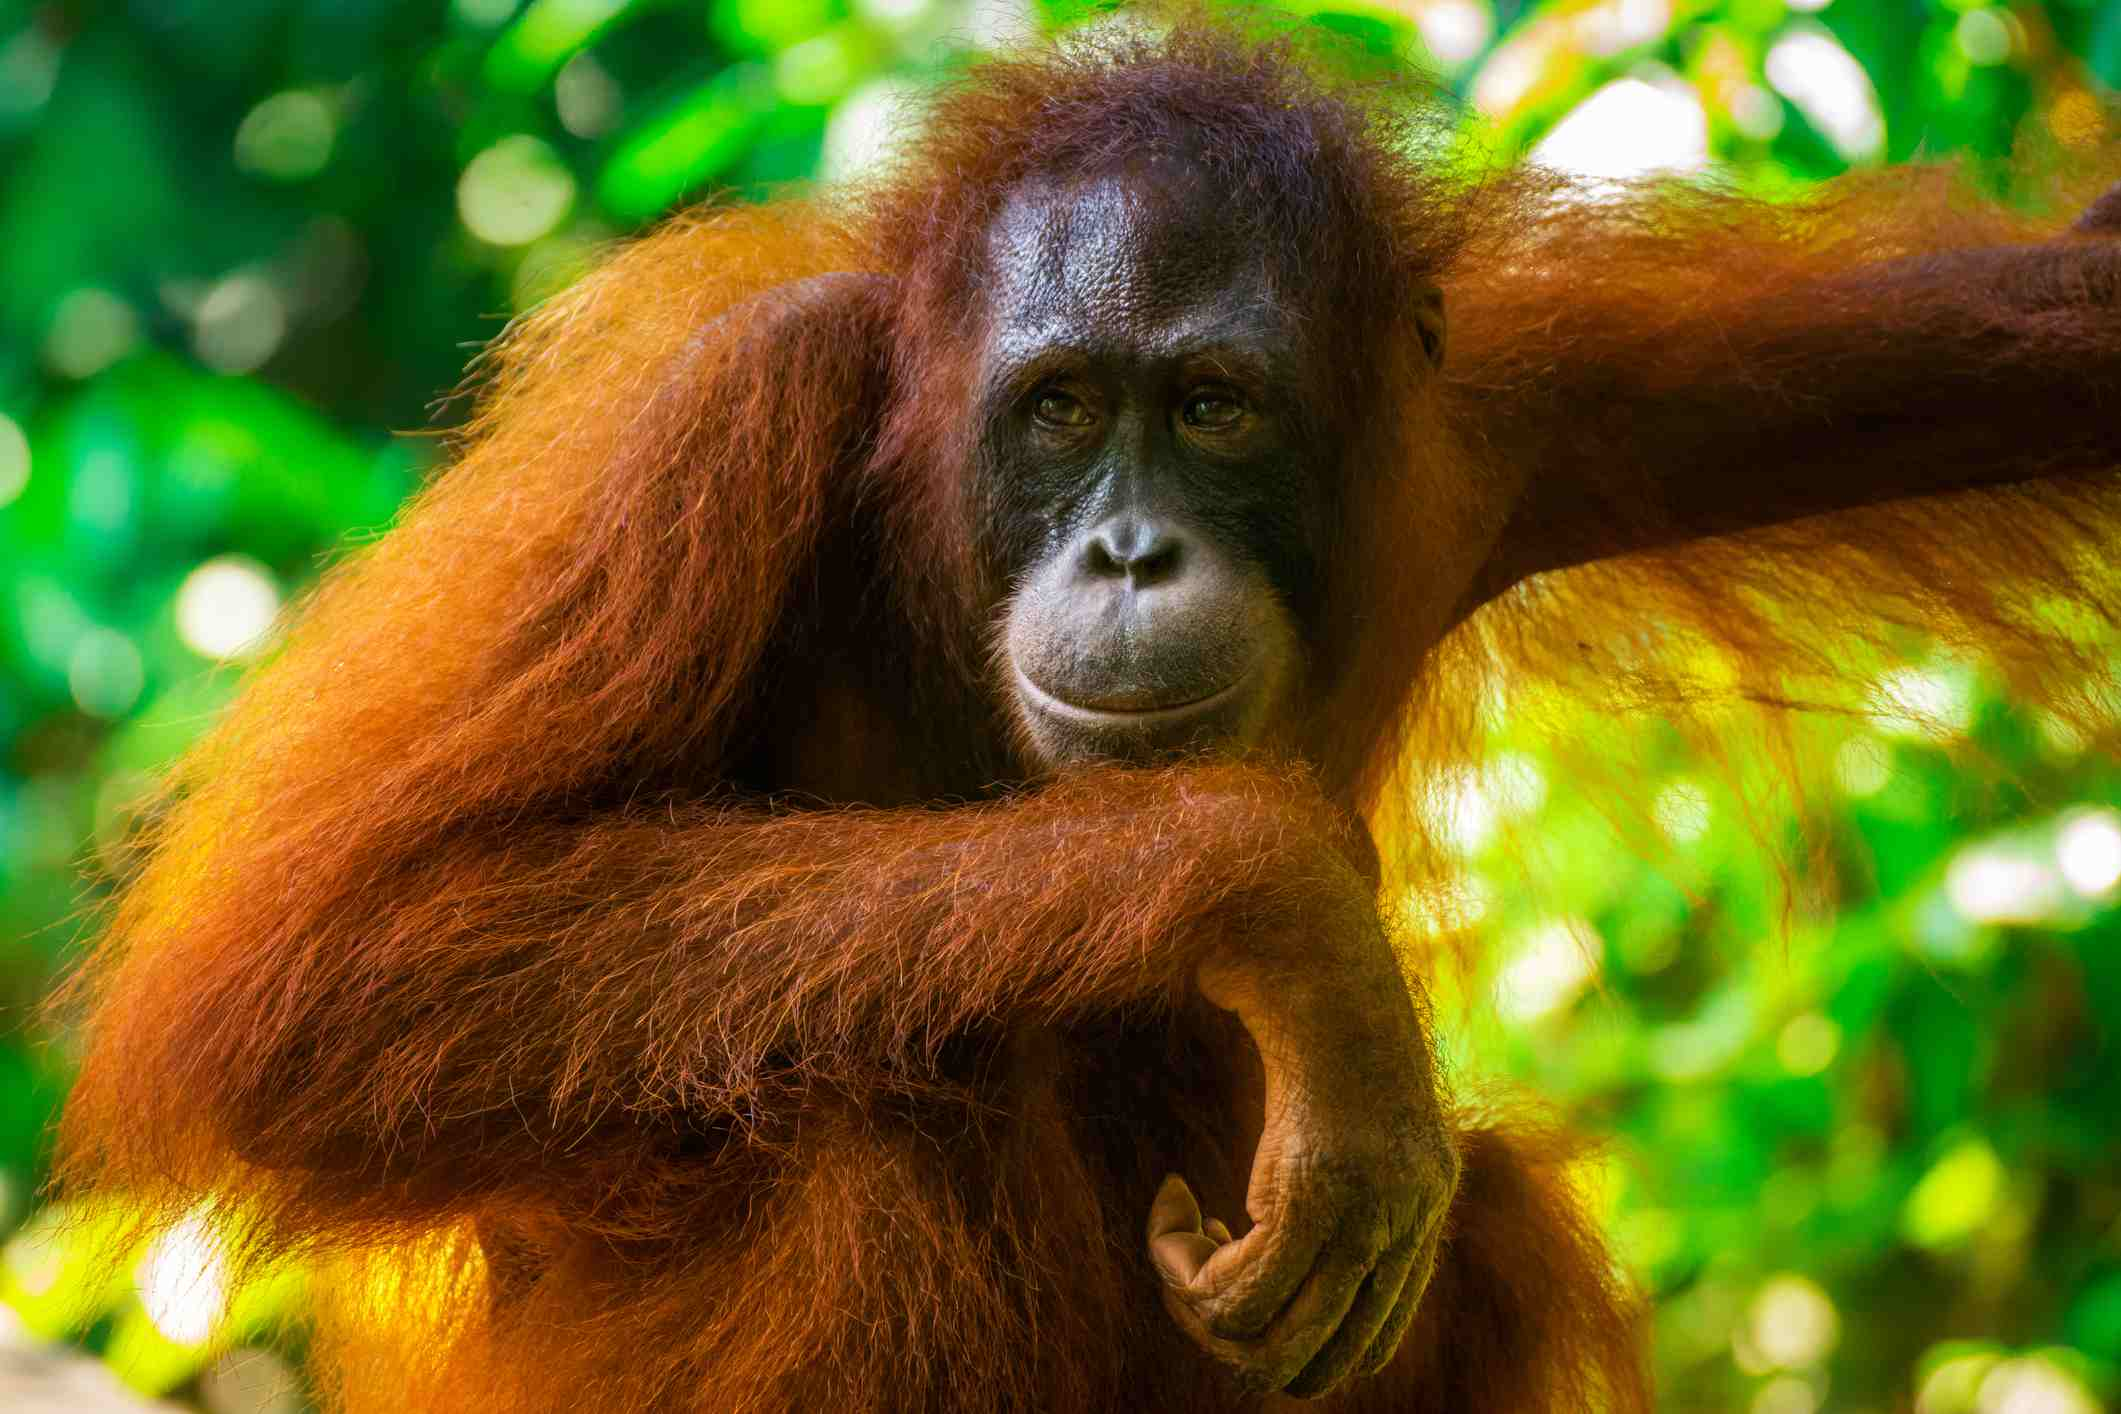 An orangutan in Gunung Leusser National Park, Sumatra